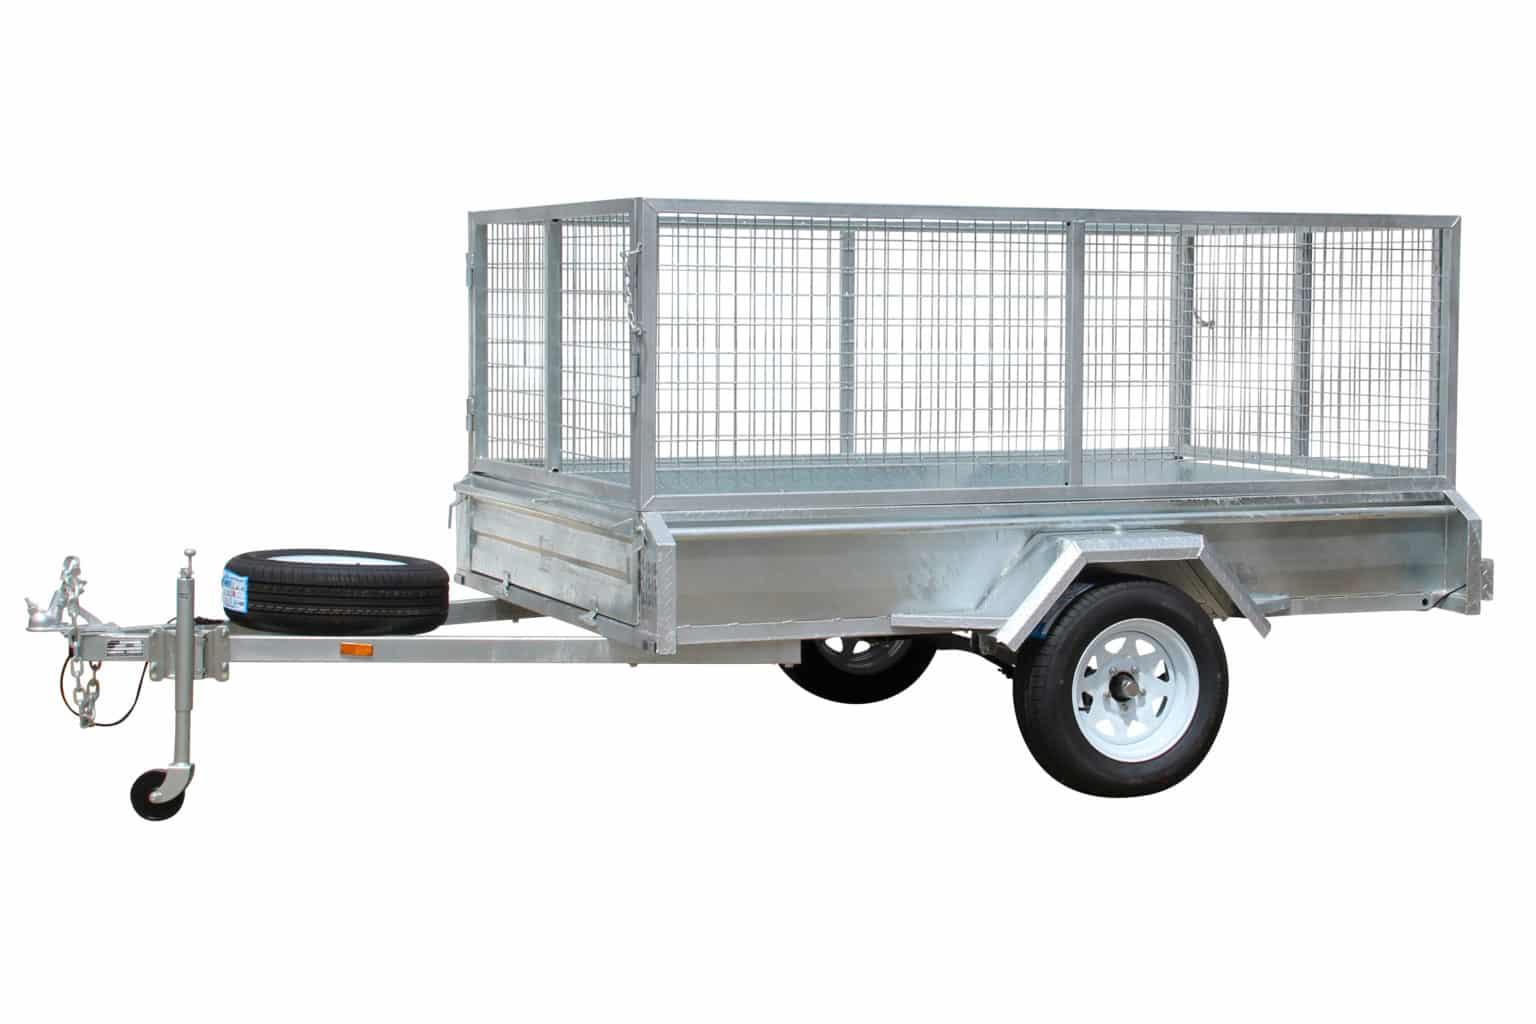 8x5 box trailer repairs Sydney